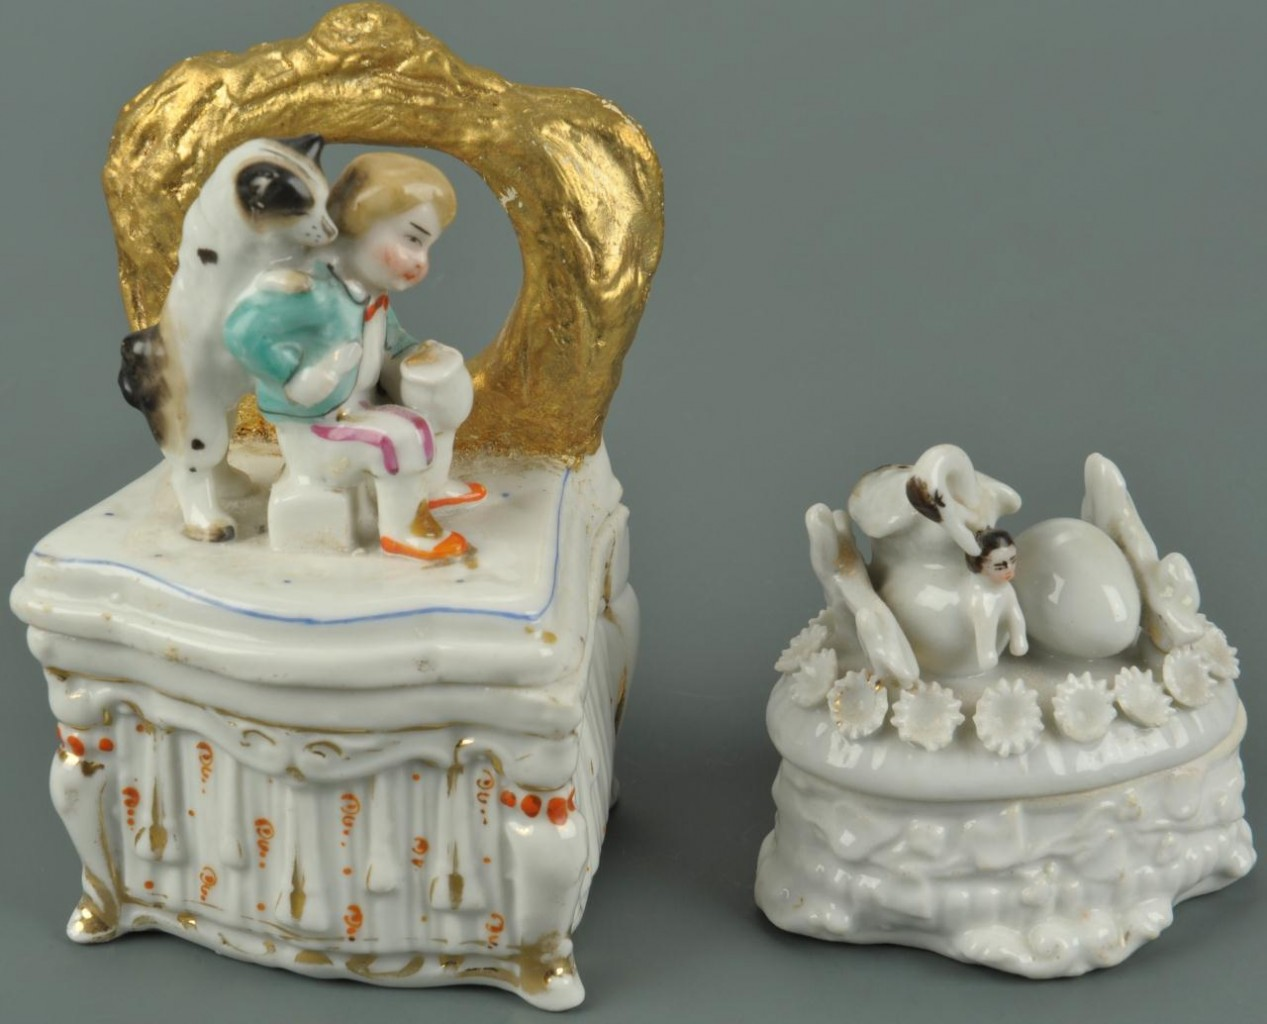 Lot 559: 5 porcelain fairings or trinket boxes